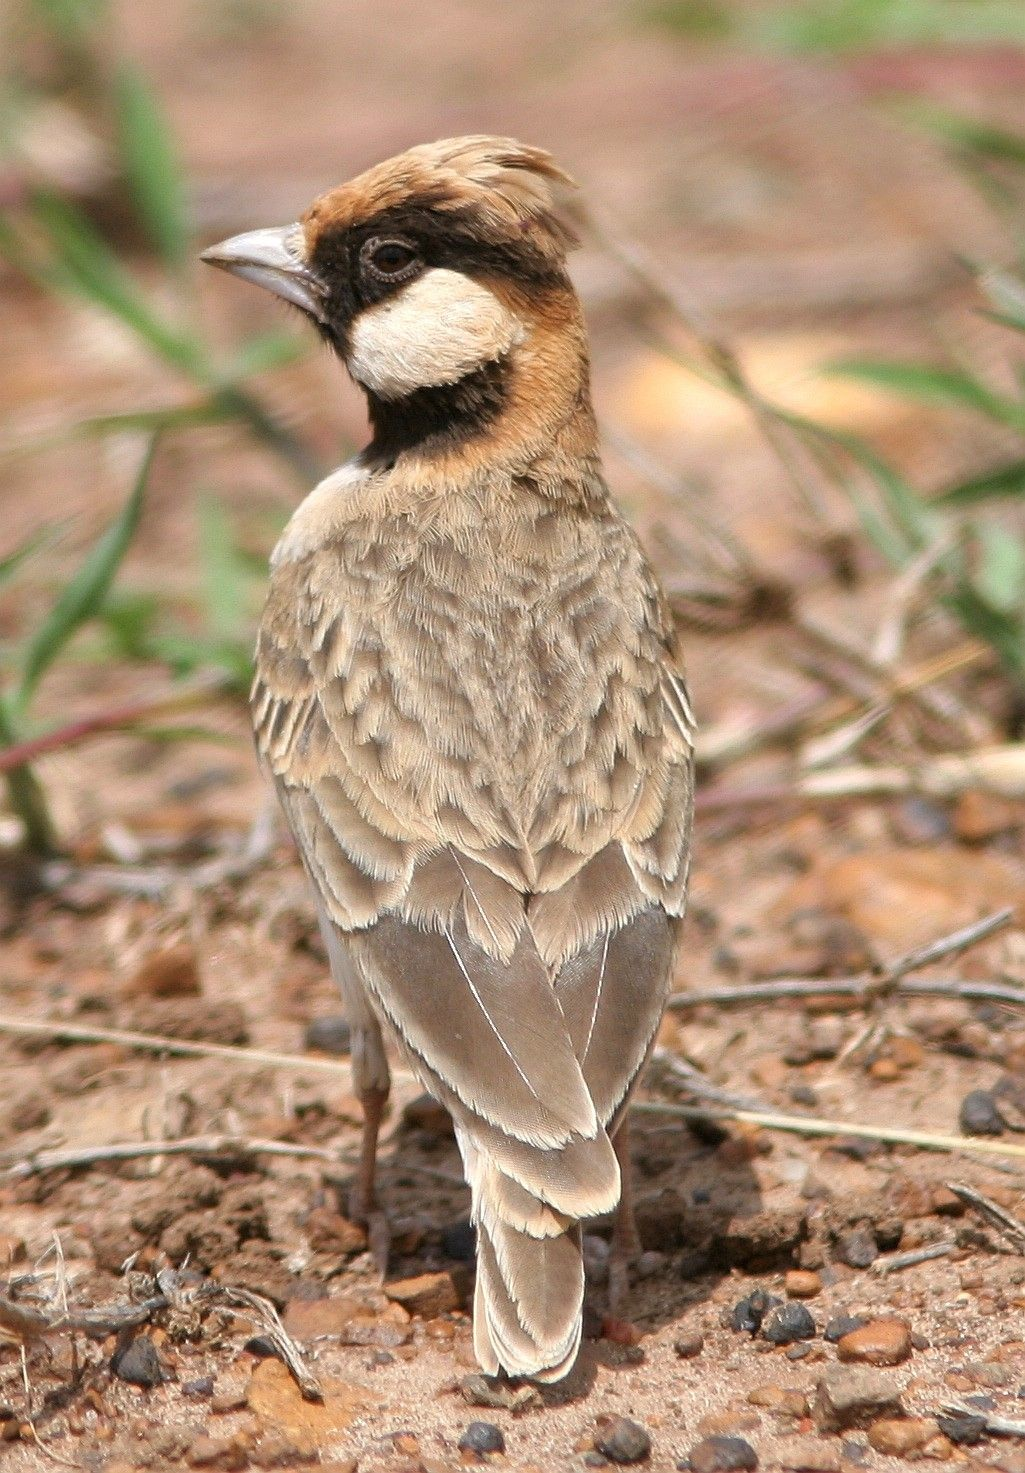 Fischer's Sparrow-Lark, Eremopterix leucopa-reia, is in the Lark family: Burundi, DR of the Congo, Kenya, Malawi, Tanzania, Uganda, Zambia. Its natural habitat is subtropical or tropical dry lowland grassland